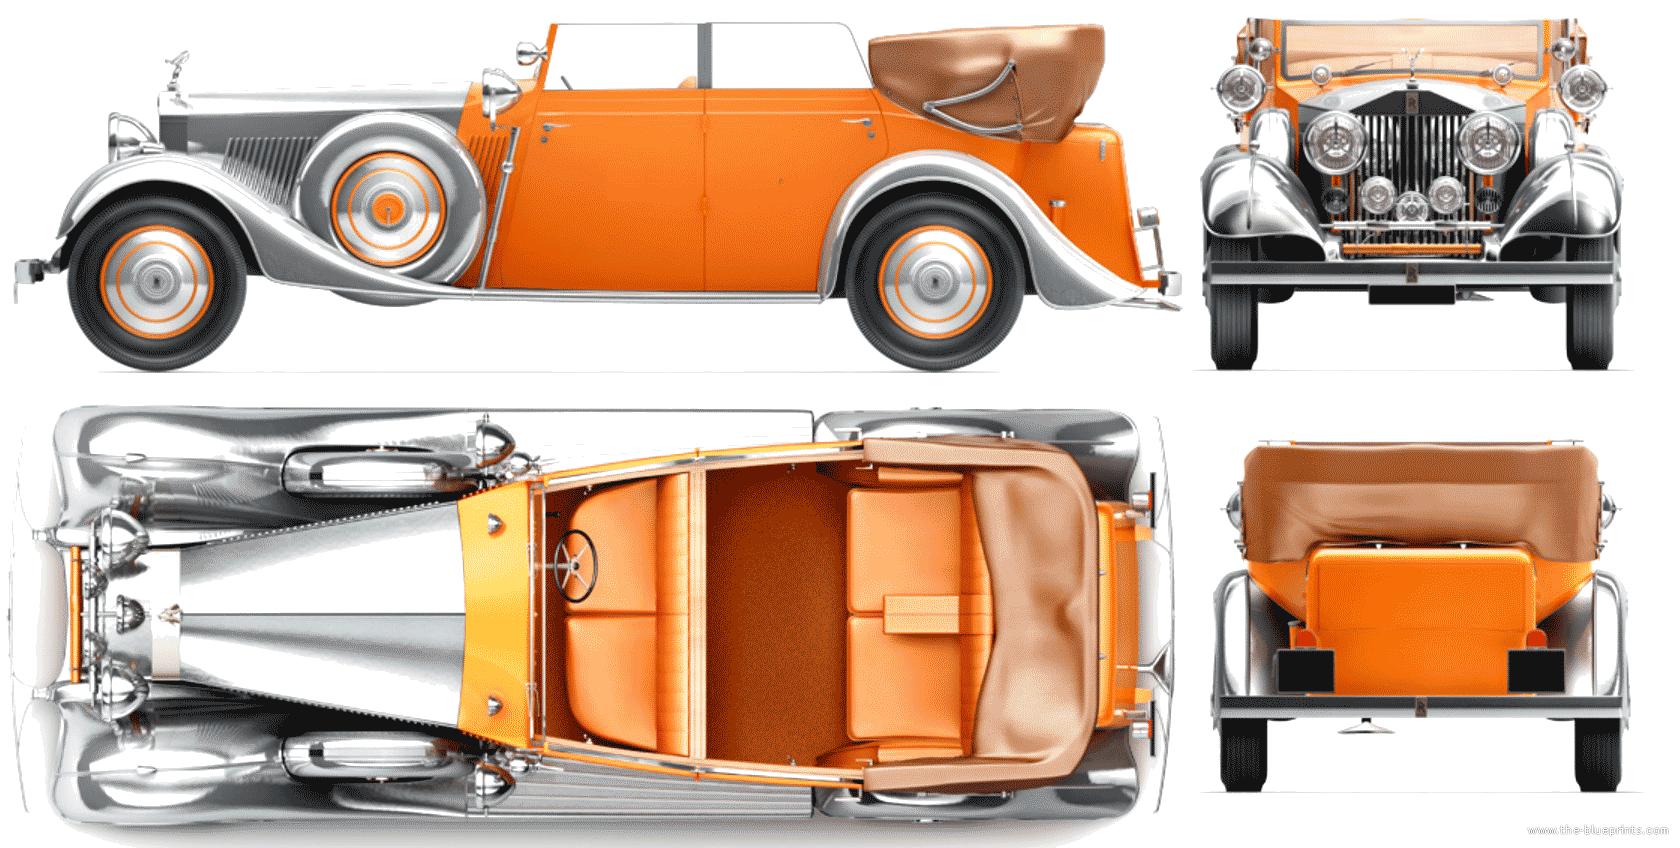 Rolls Royce Phantom Ii Star Of India Thrupp And Marbely Cabriolet Sedan 1934 Rolls Royce Rolls Royce Phantom Classic Rolls Royce